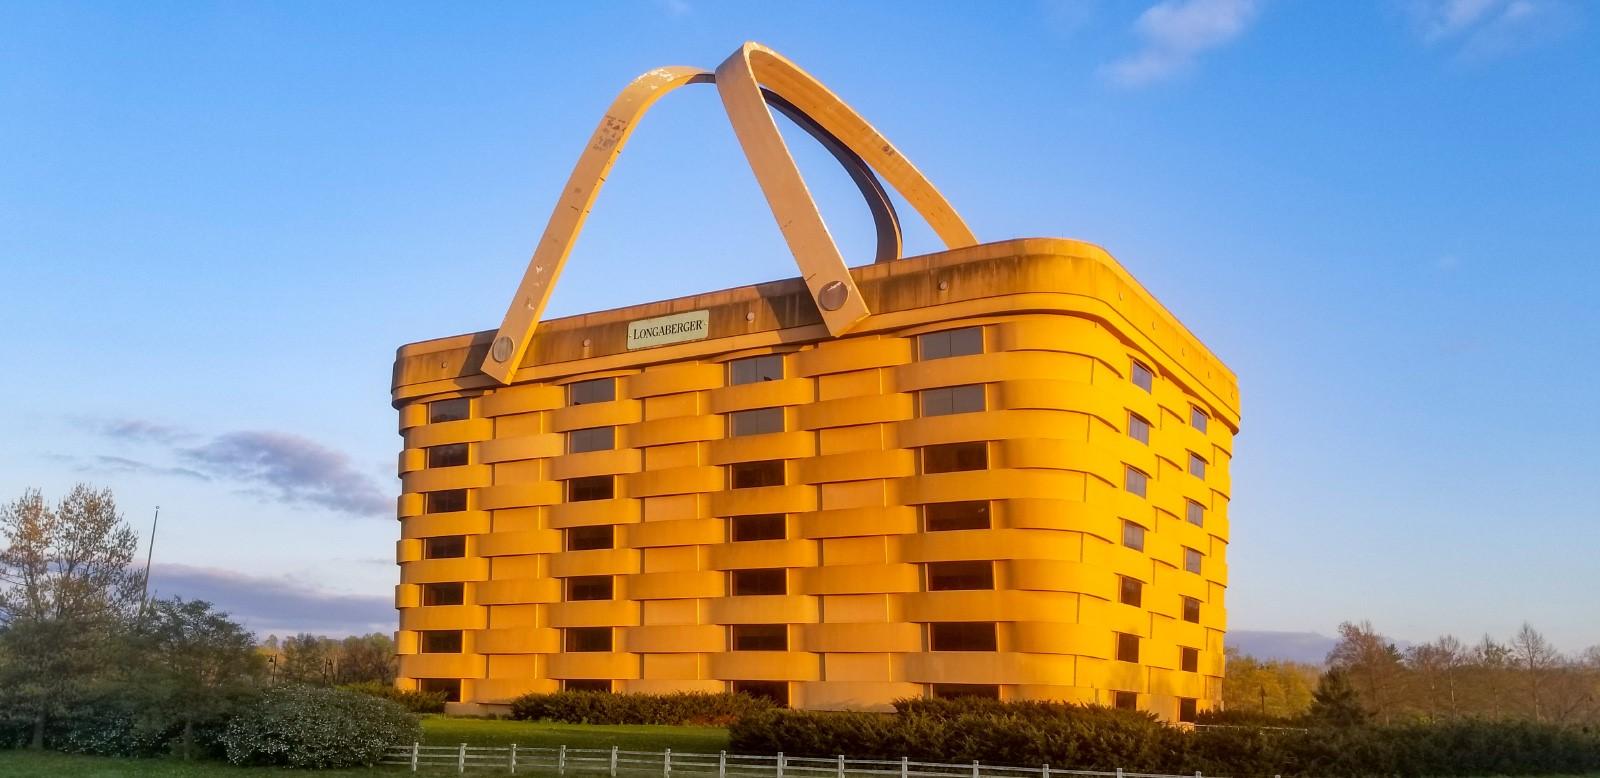 Kitsch Architecture: Developed by industrialization and urbanization Sheet6